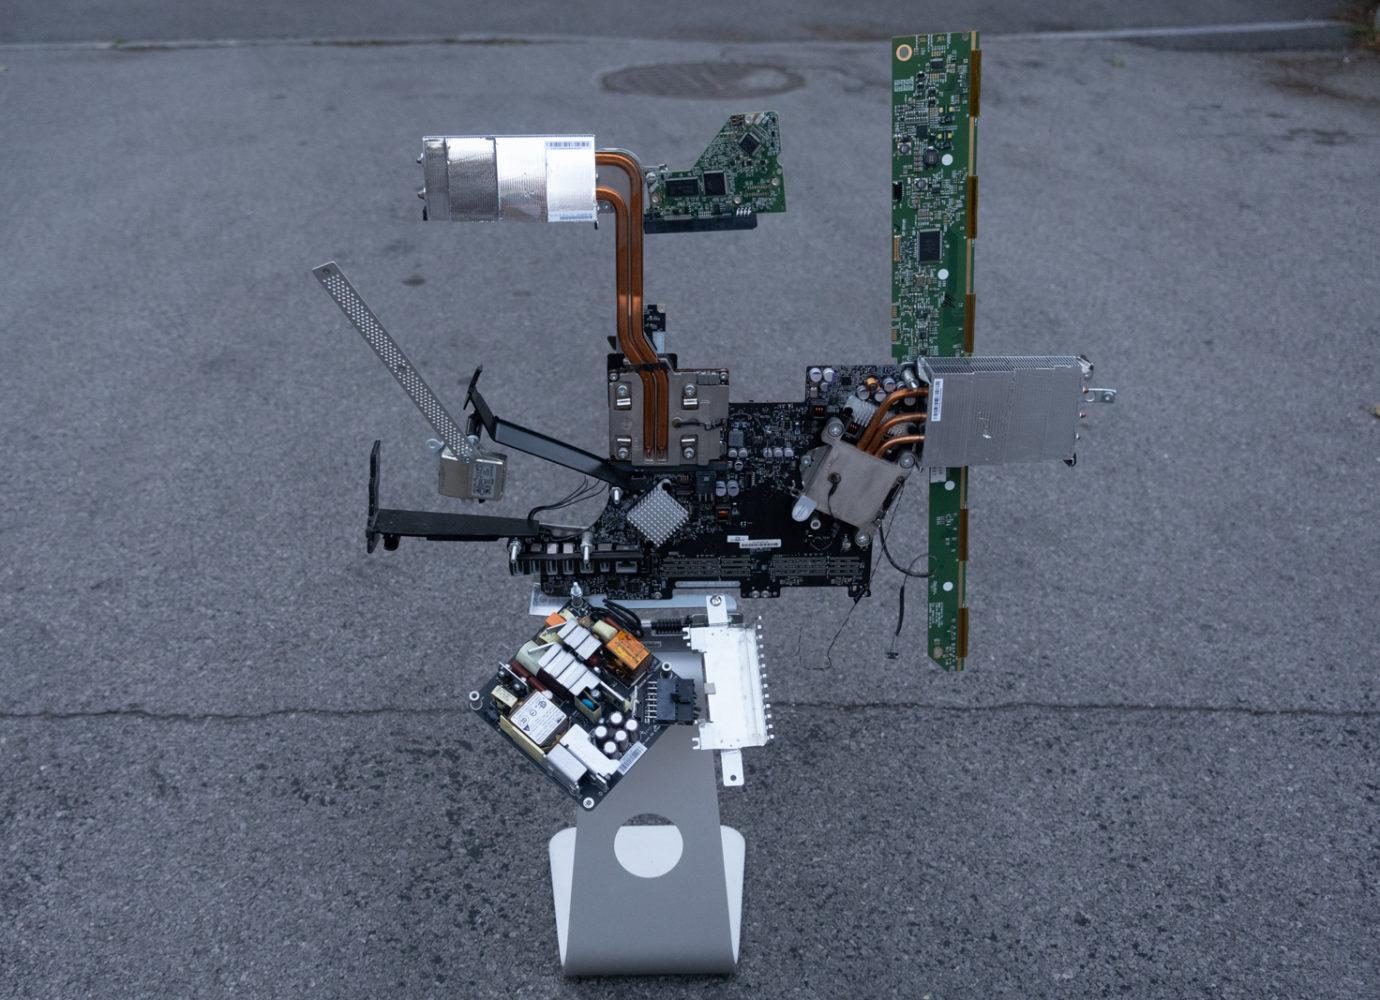 Peter Monacelli 2011 iMac2011 rearranged